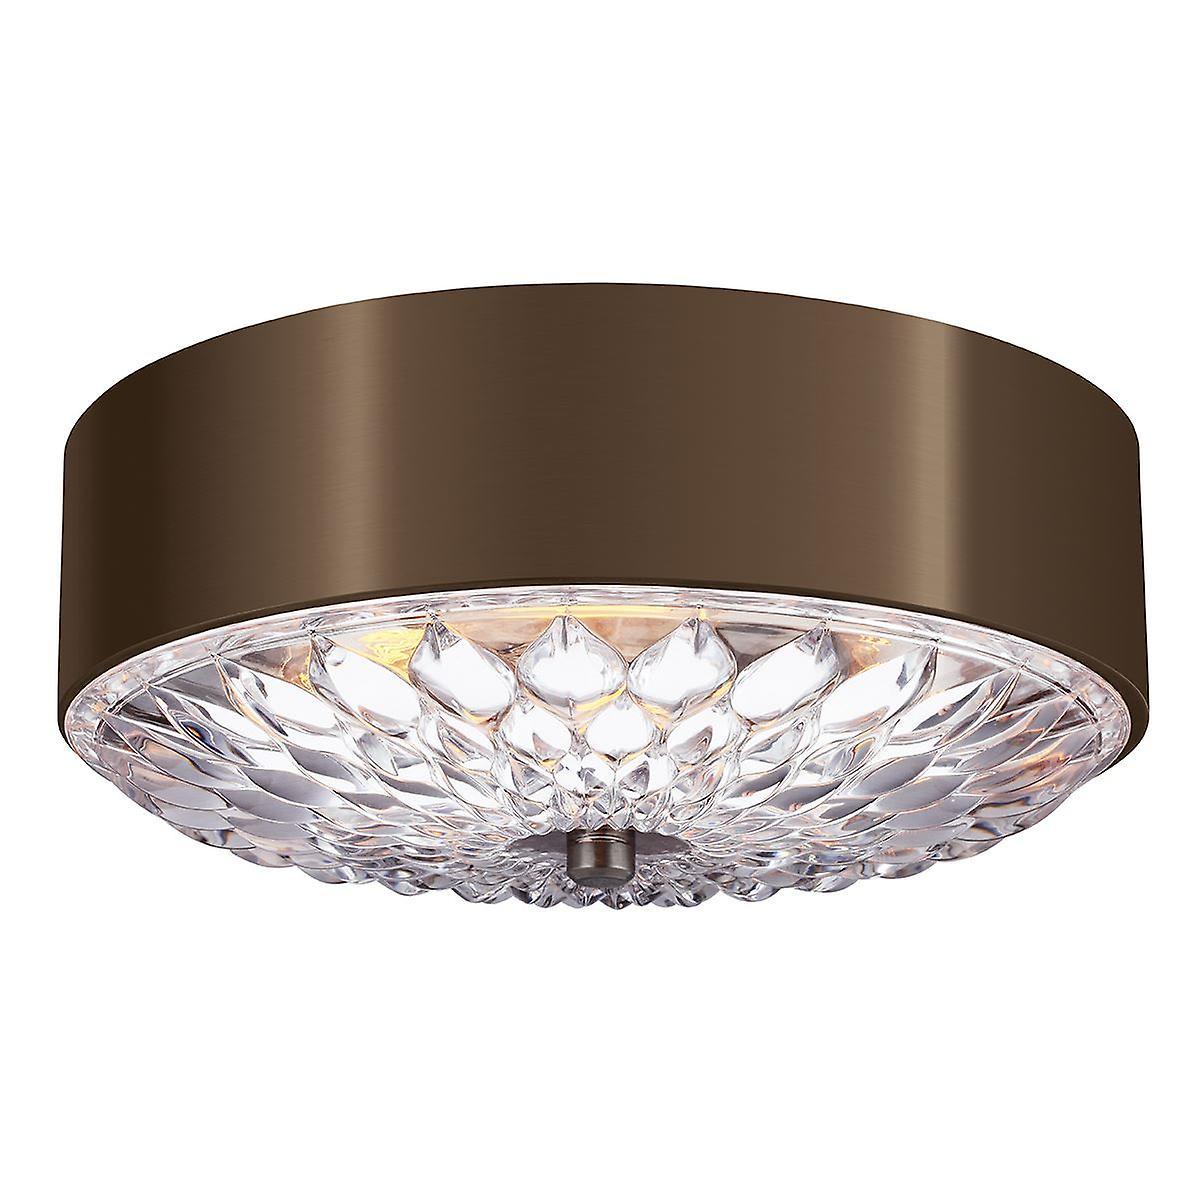 Elstead - 3 Light Medium Flush Mount - Dark Brass Finish - FE BOTANIC F M